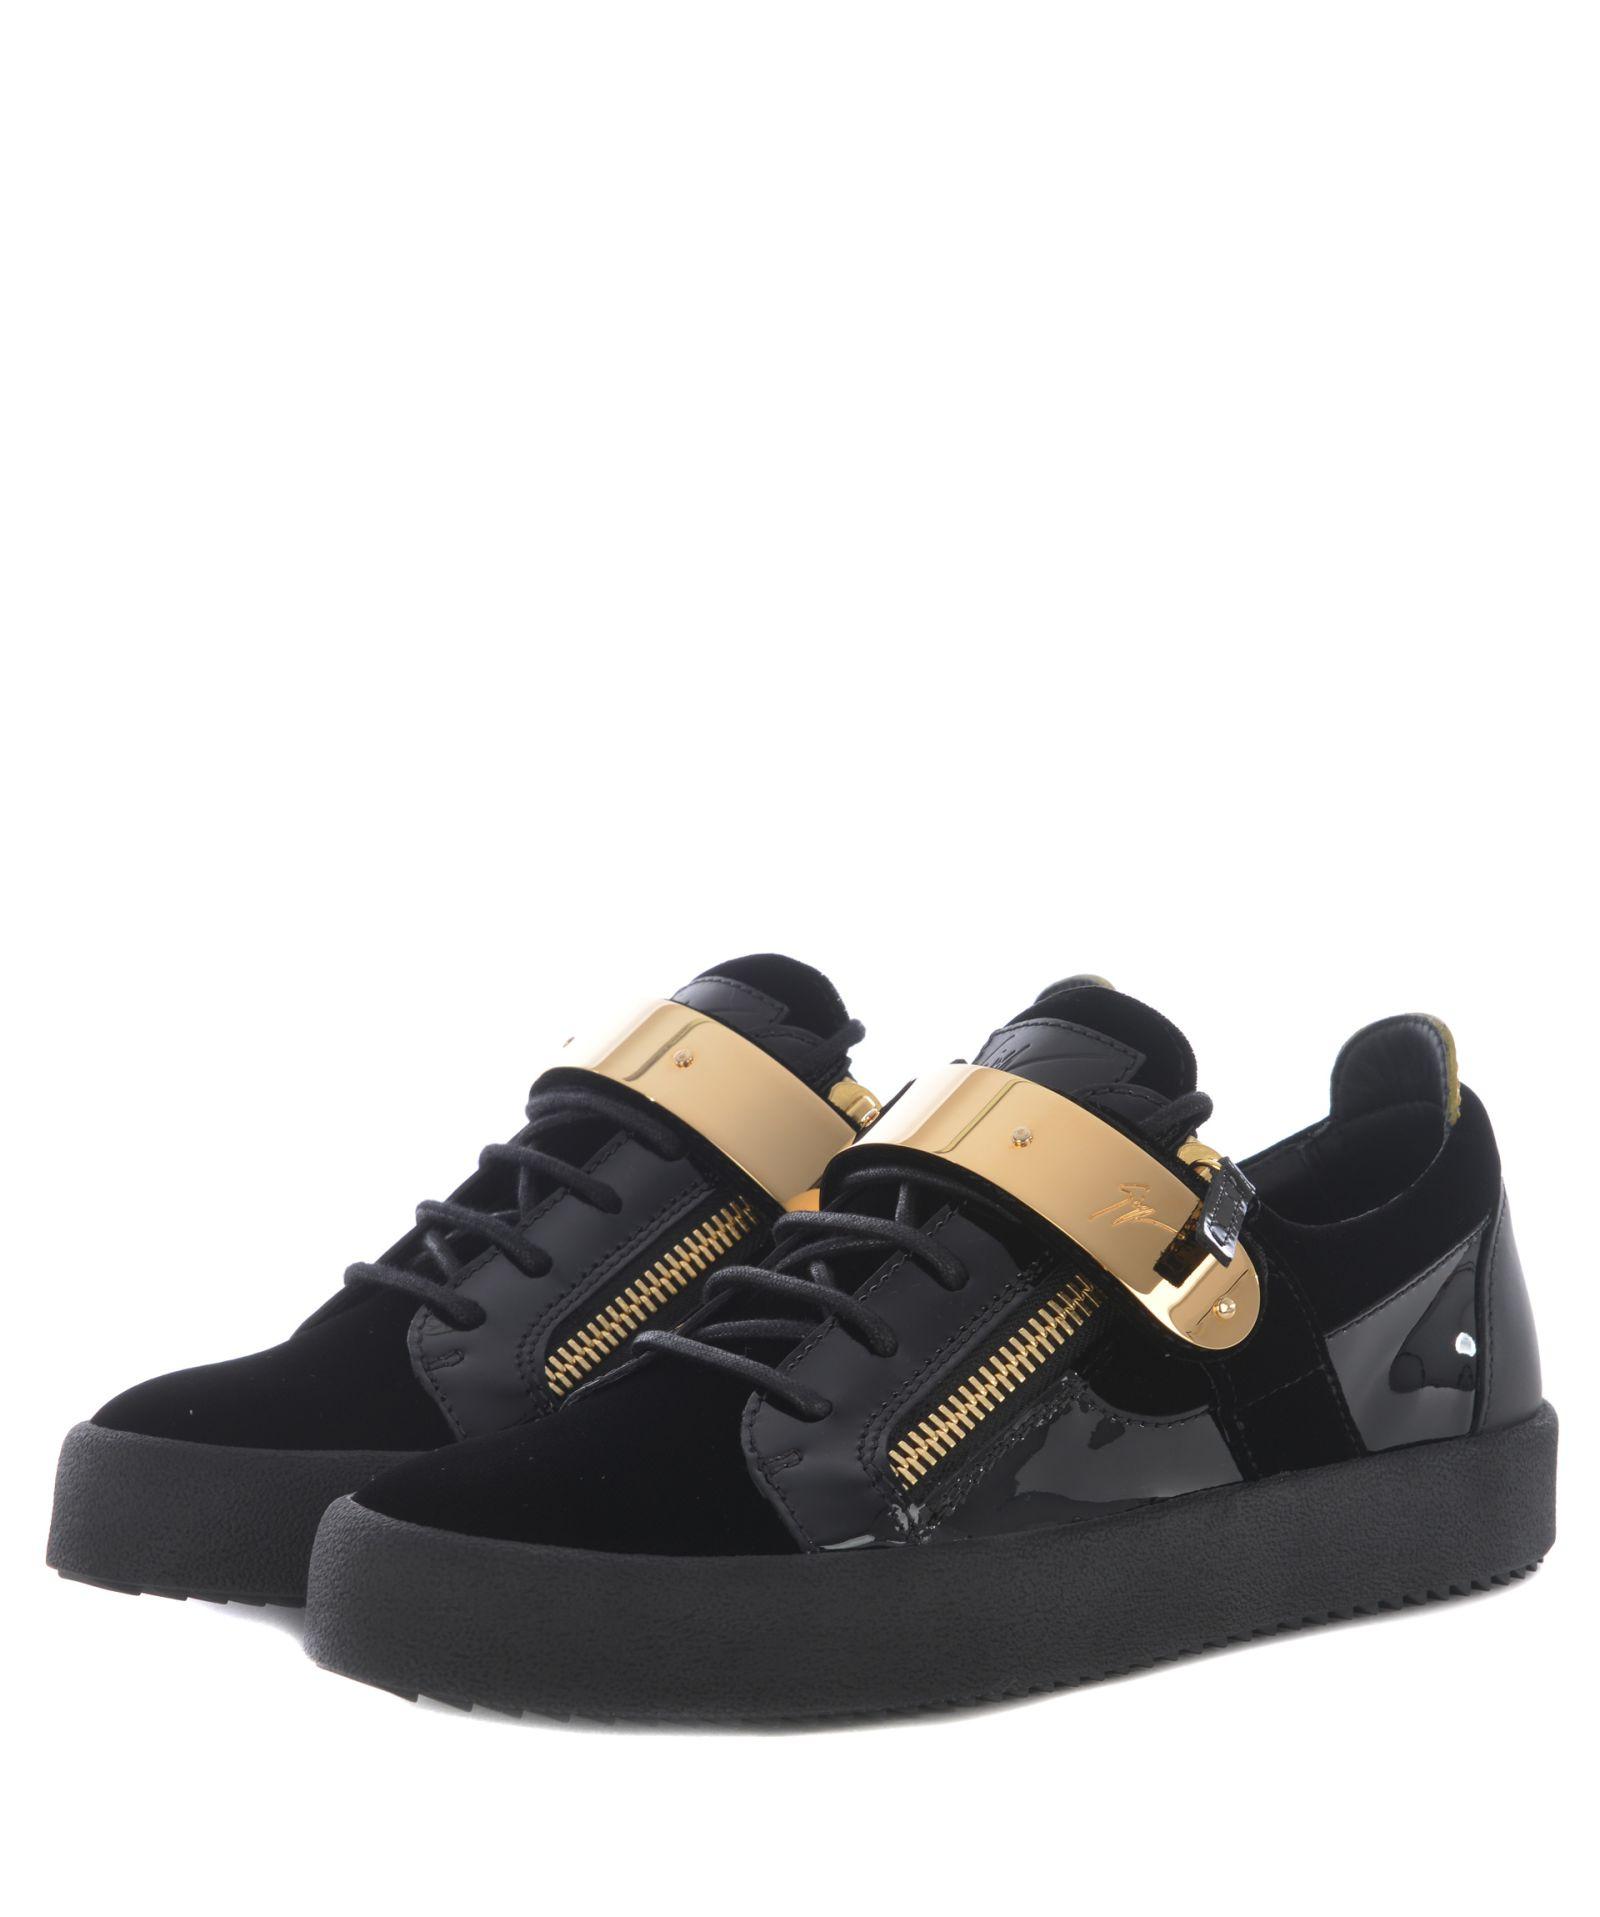 98f1df68bdf8 Giuseppe Zanotti Giuseppe Zanotti Veronica Sneakers - Nero - 9456050 ...